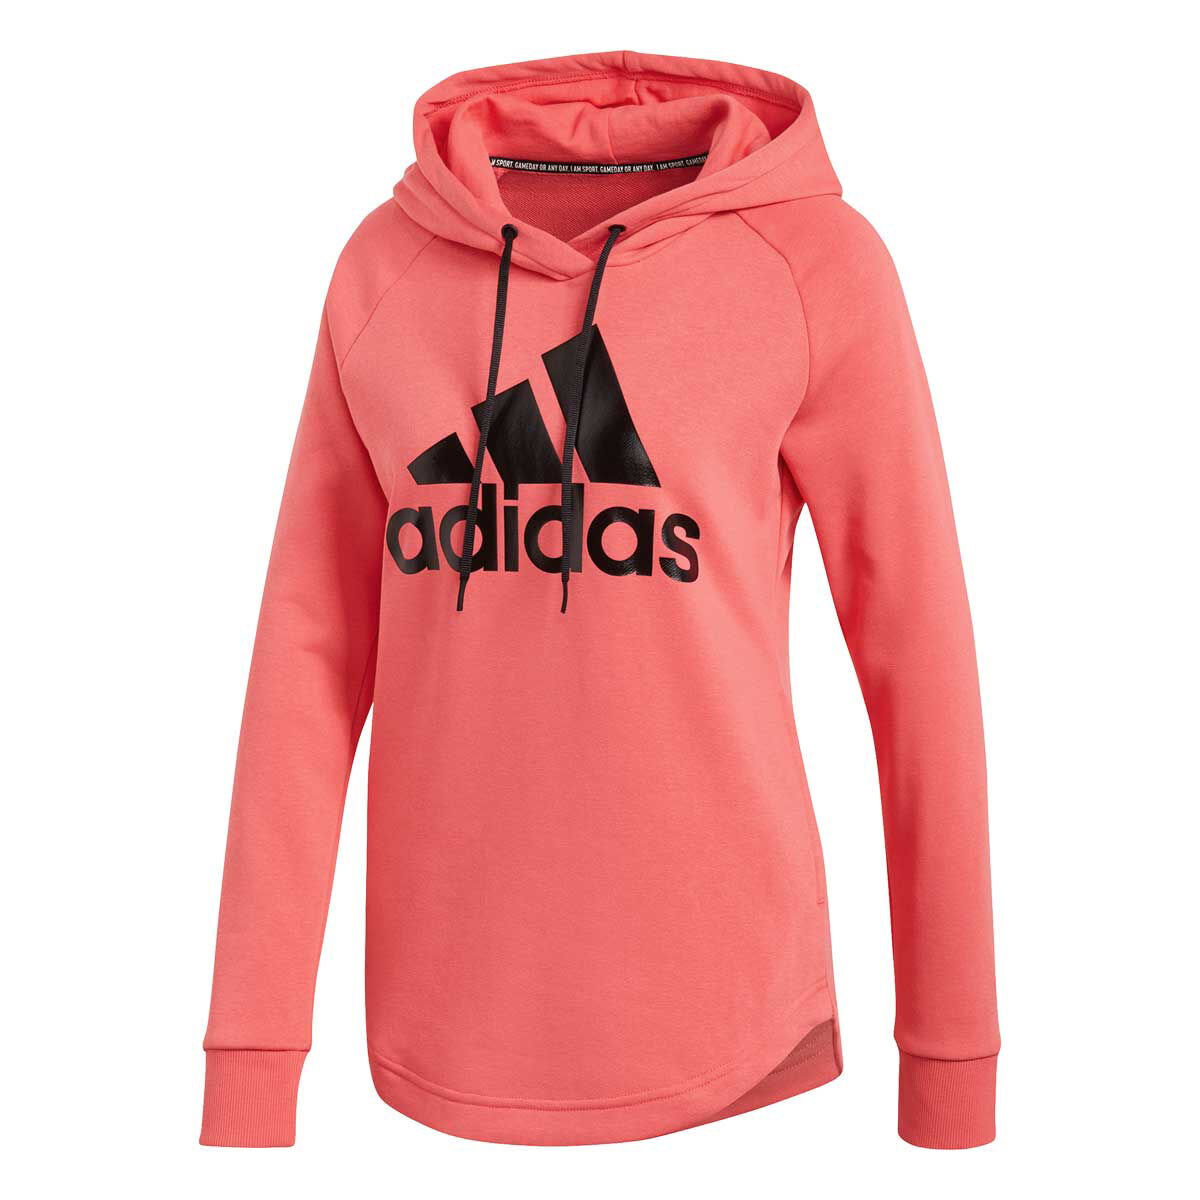 adidas Womens Must Haves Badge Of Sport Hoodie Pink XS